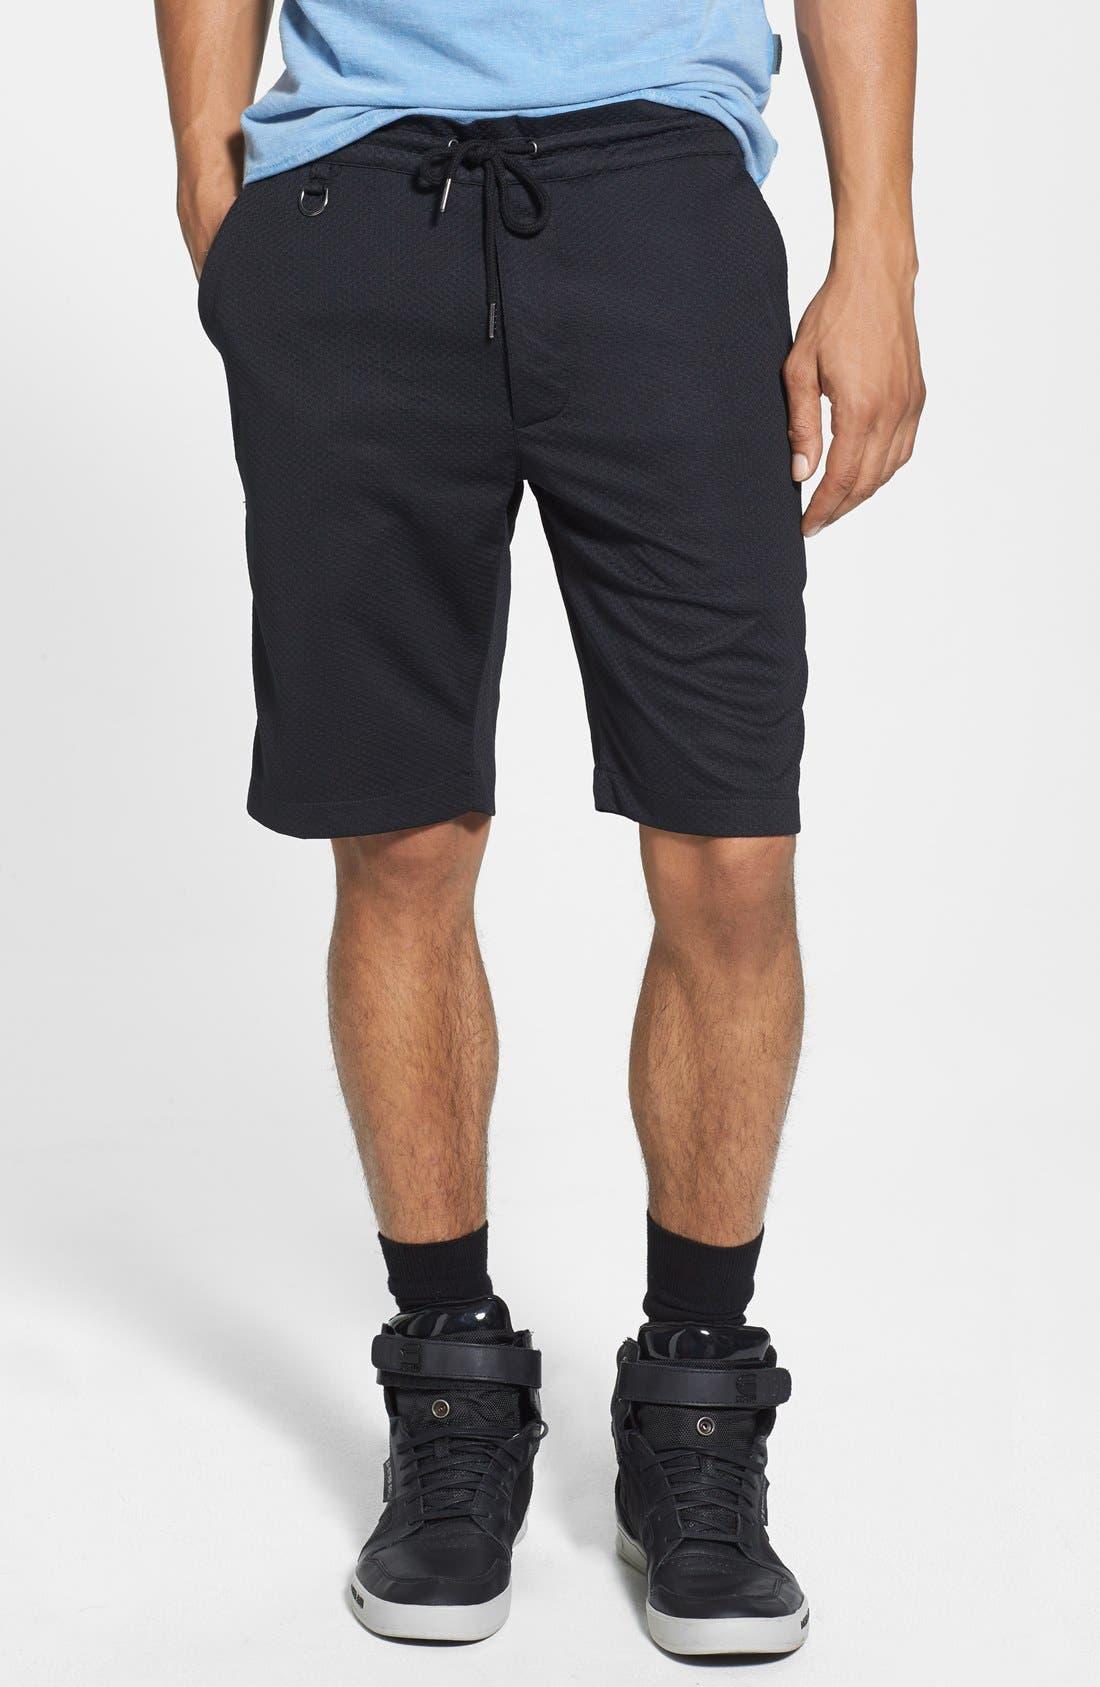 Main Image - PUBLISH BRAND 'Torres' Mesh Shorts